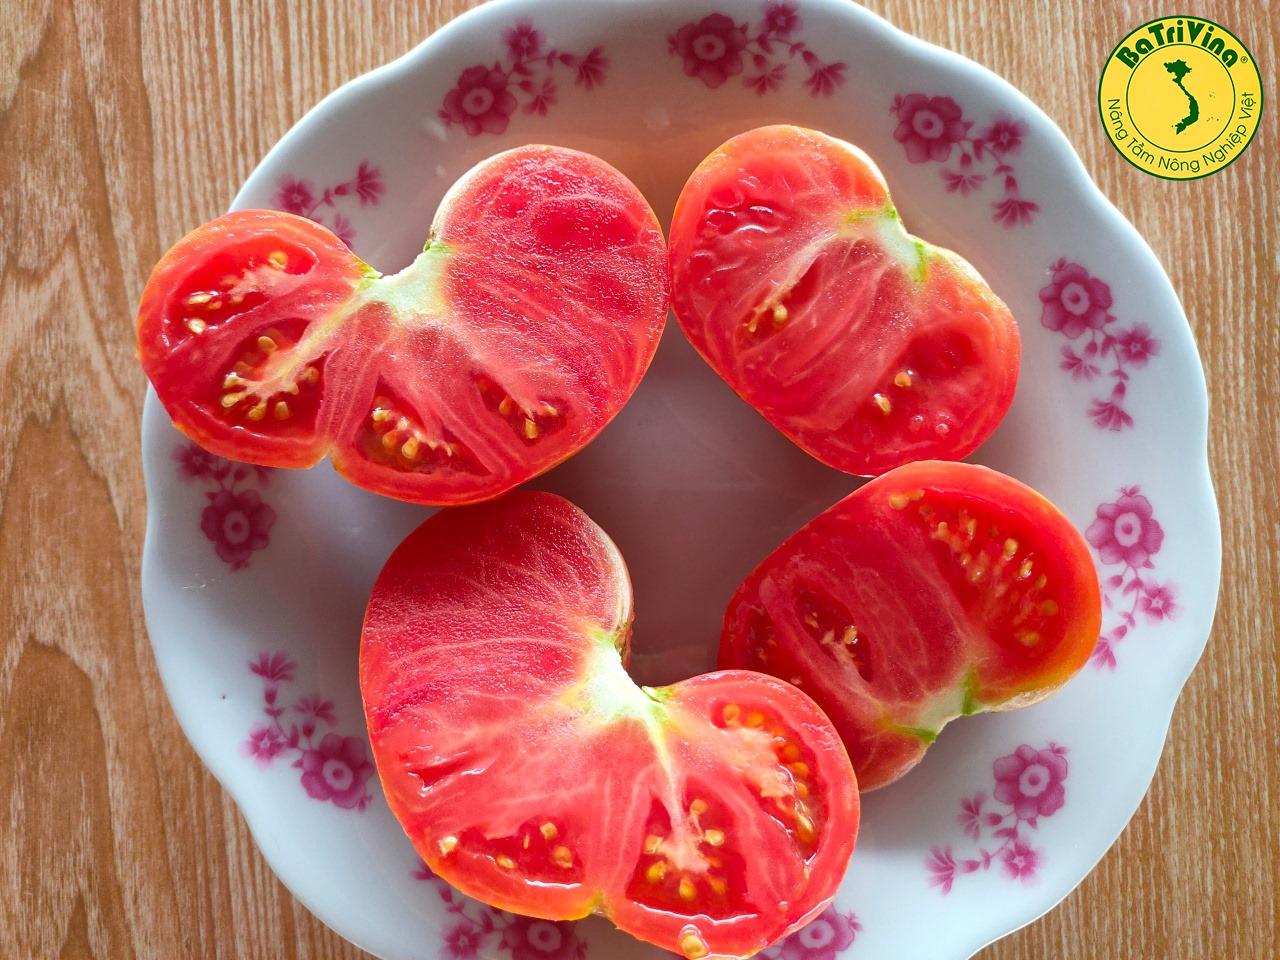 Cà chua Beef Flavor Socola - Combo 10 hạt giống